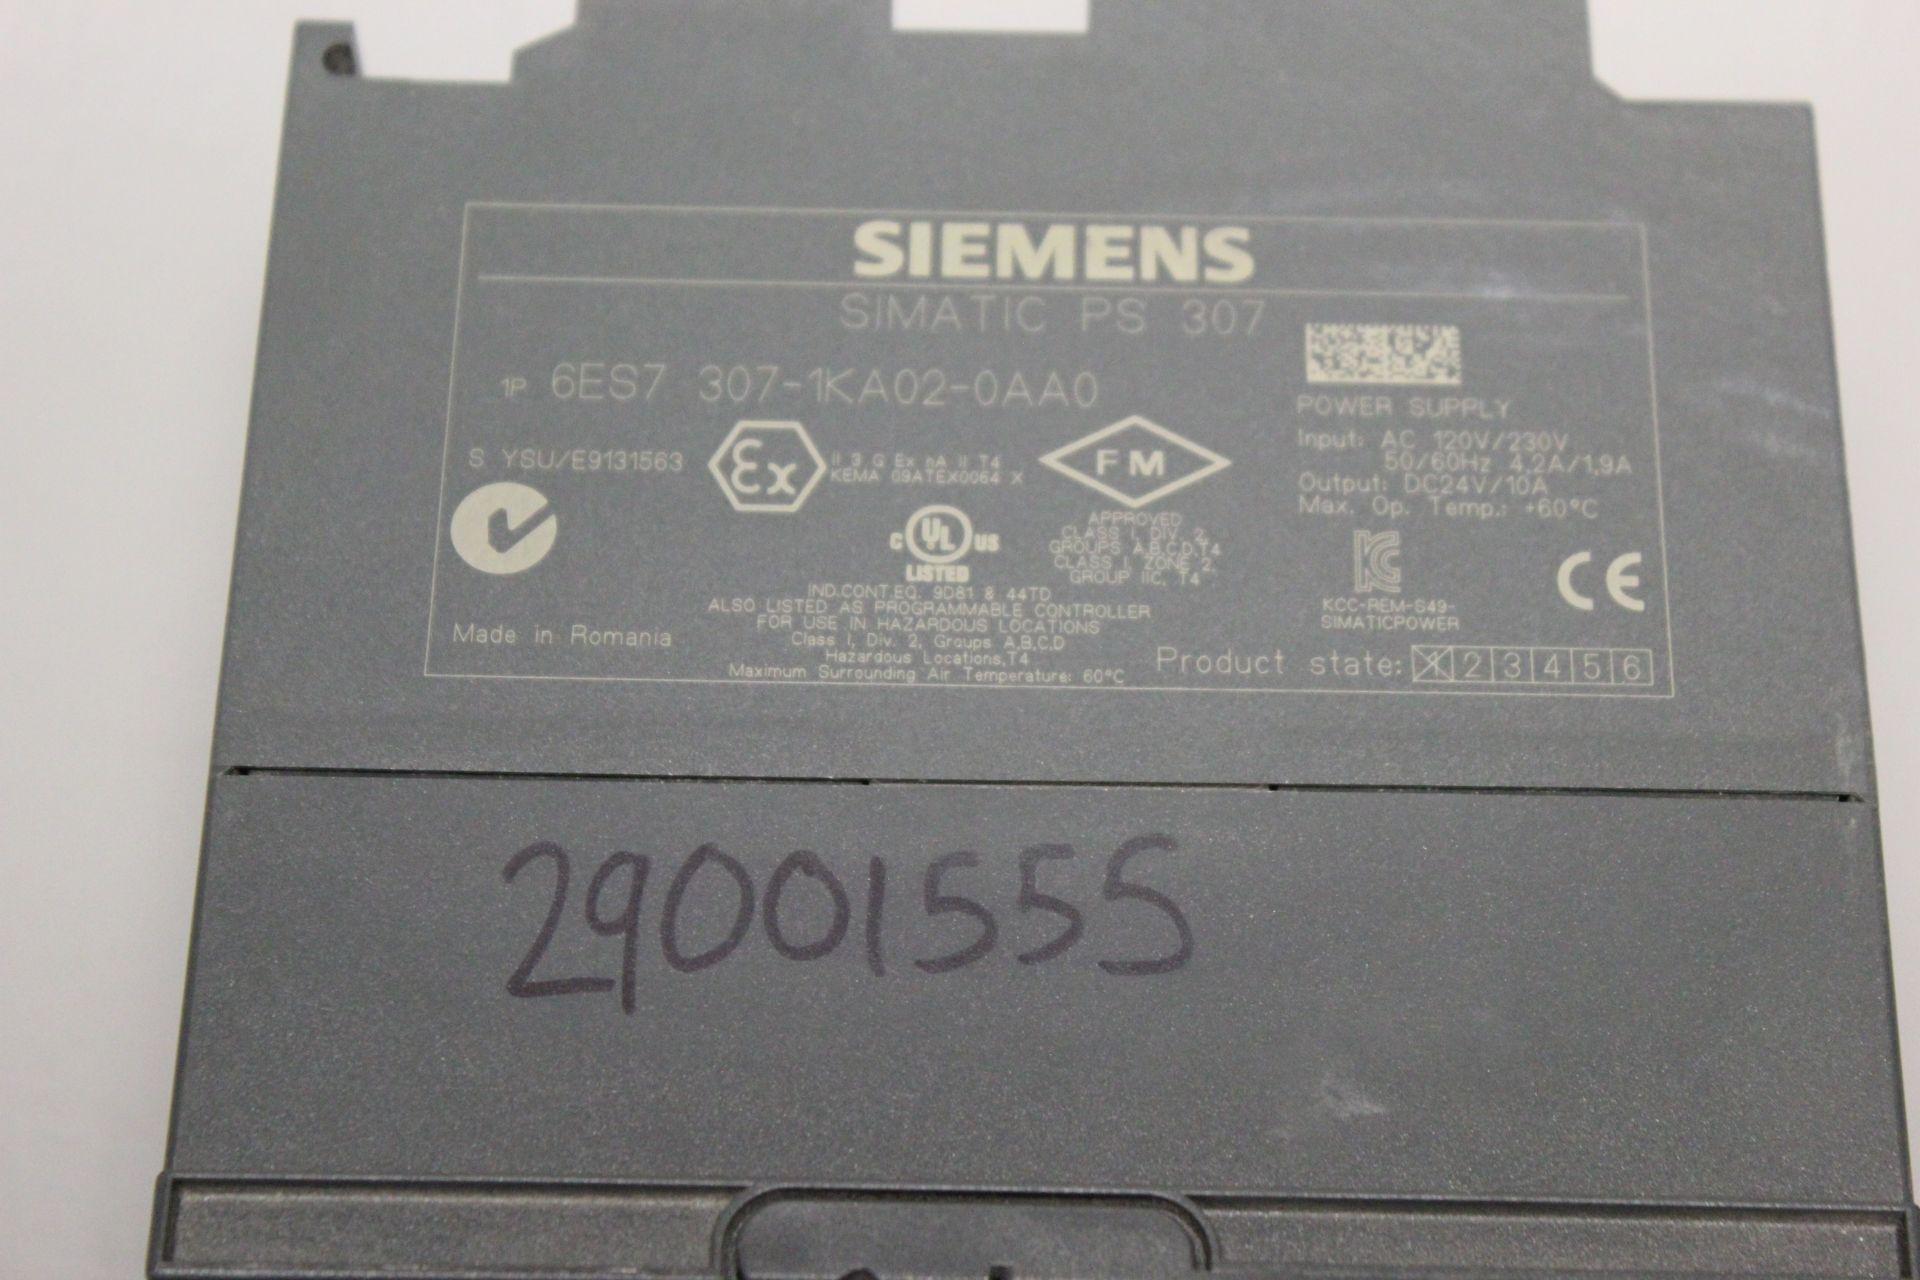 SIEMENS SIMATIC PLC POWER SUPPLY - Image 3 of 3